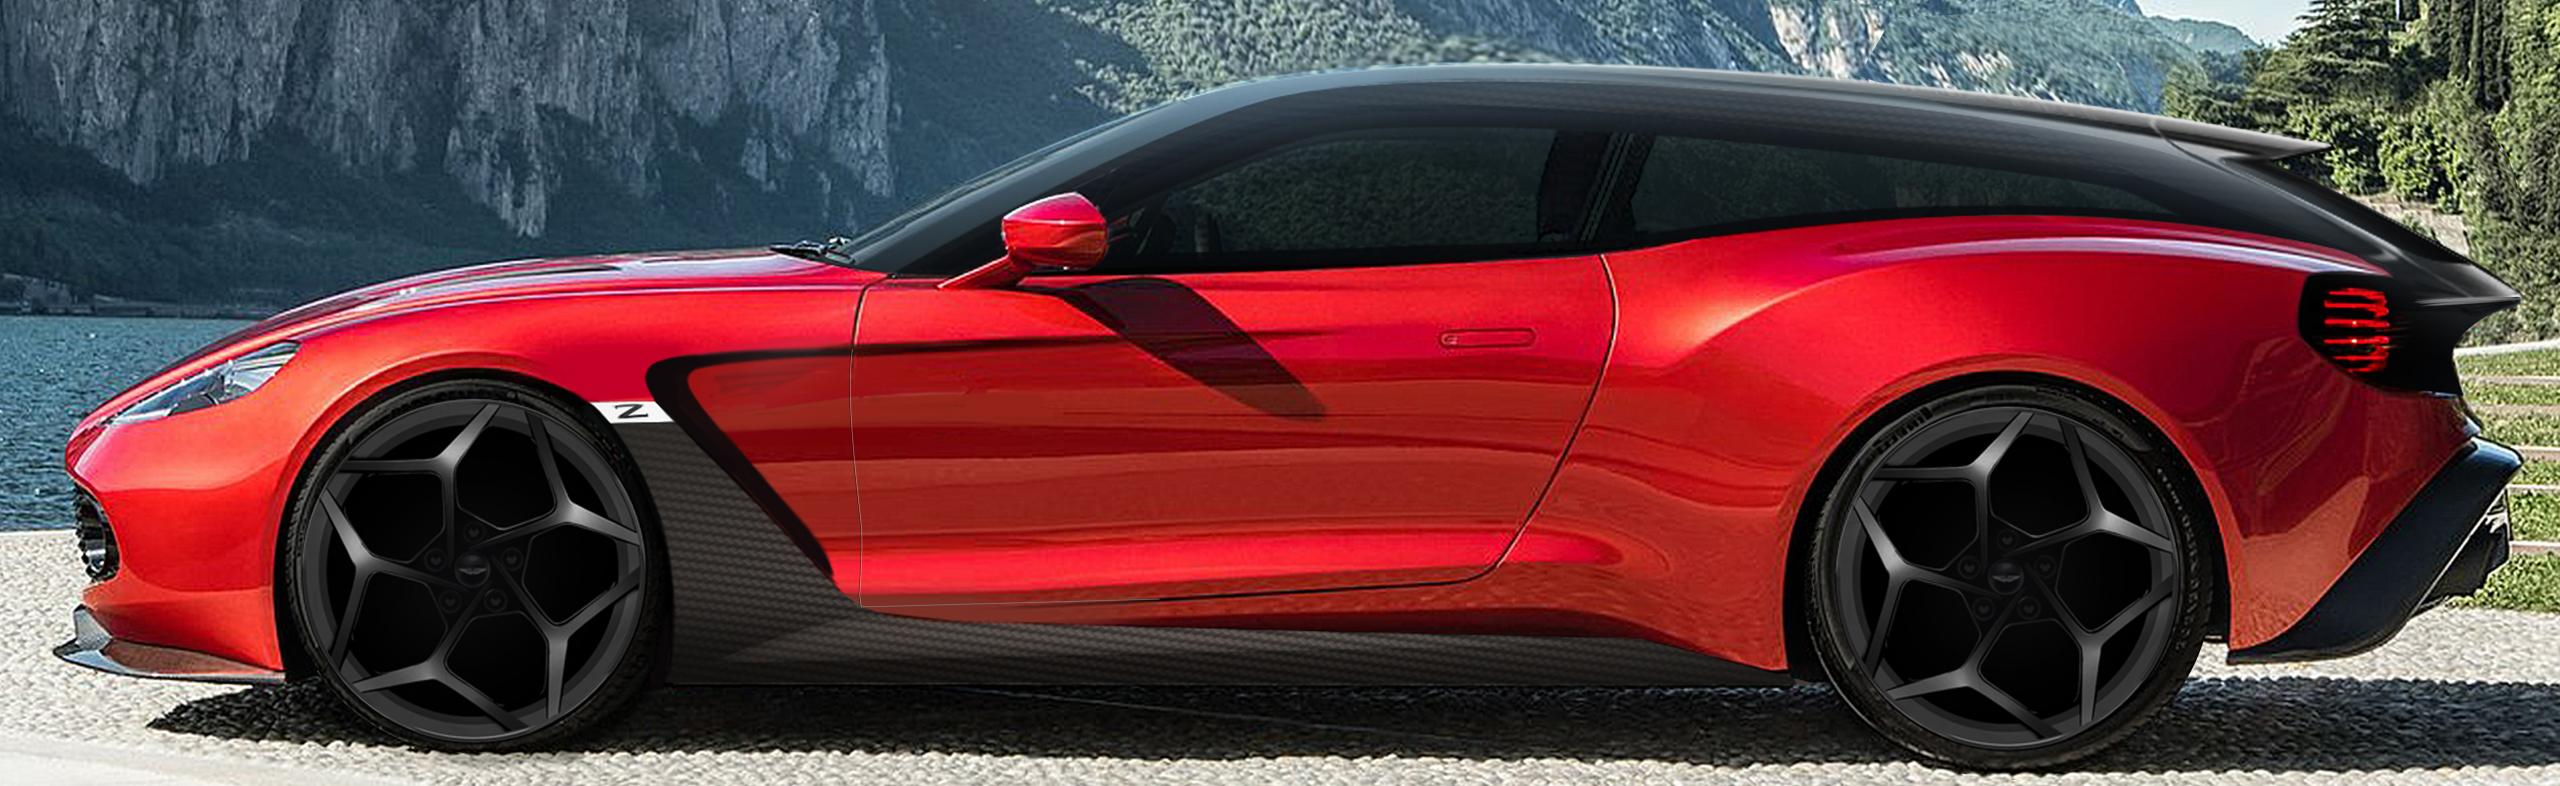 Aston Martin Vanquish Zagato Shooting Brake sketch